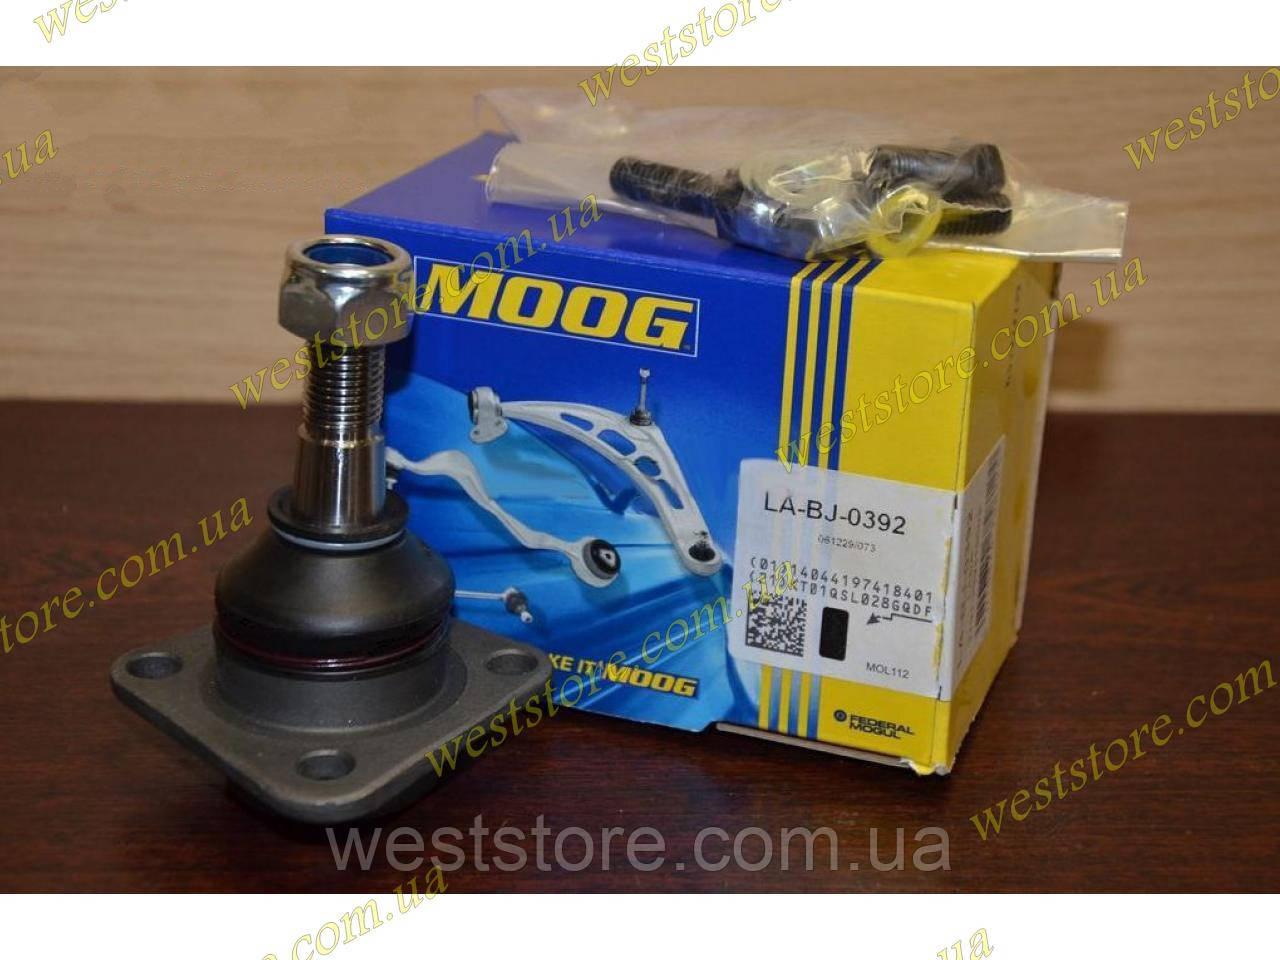 Шаровая опора Ваз 2101 2102 2103 2104 2105 2106 2107 2121 нива верхняя Moog